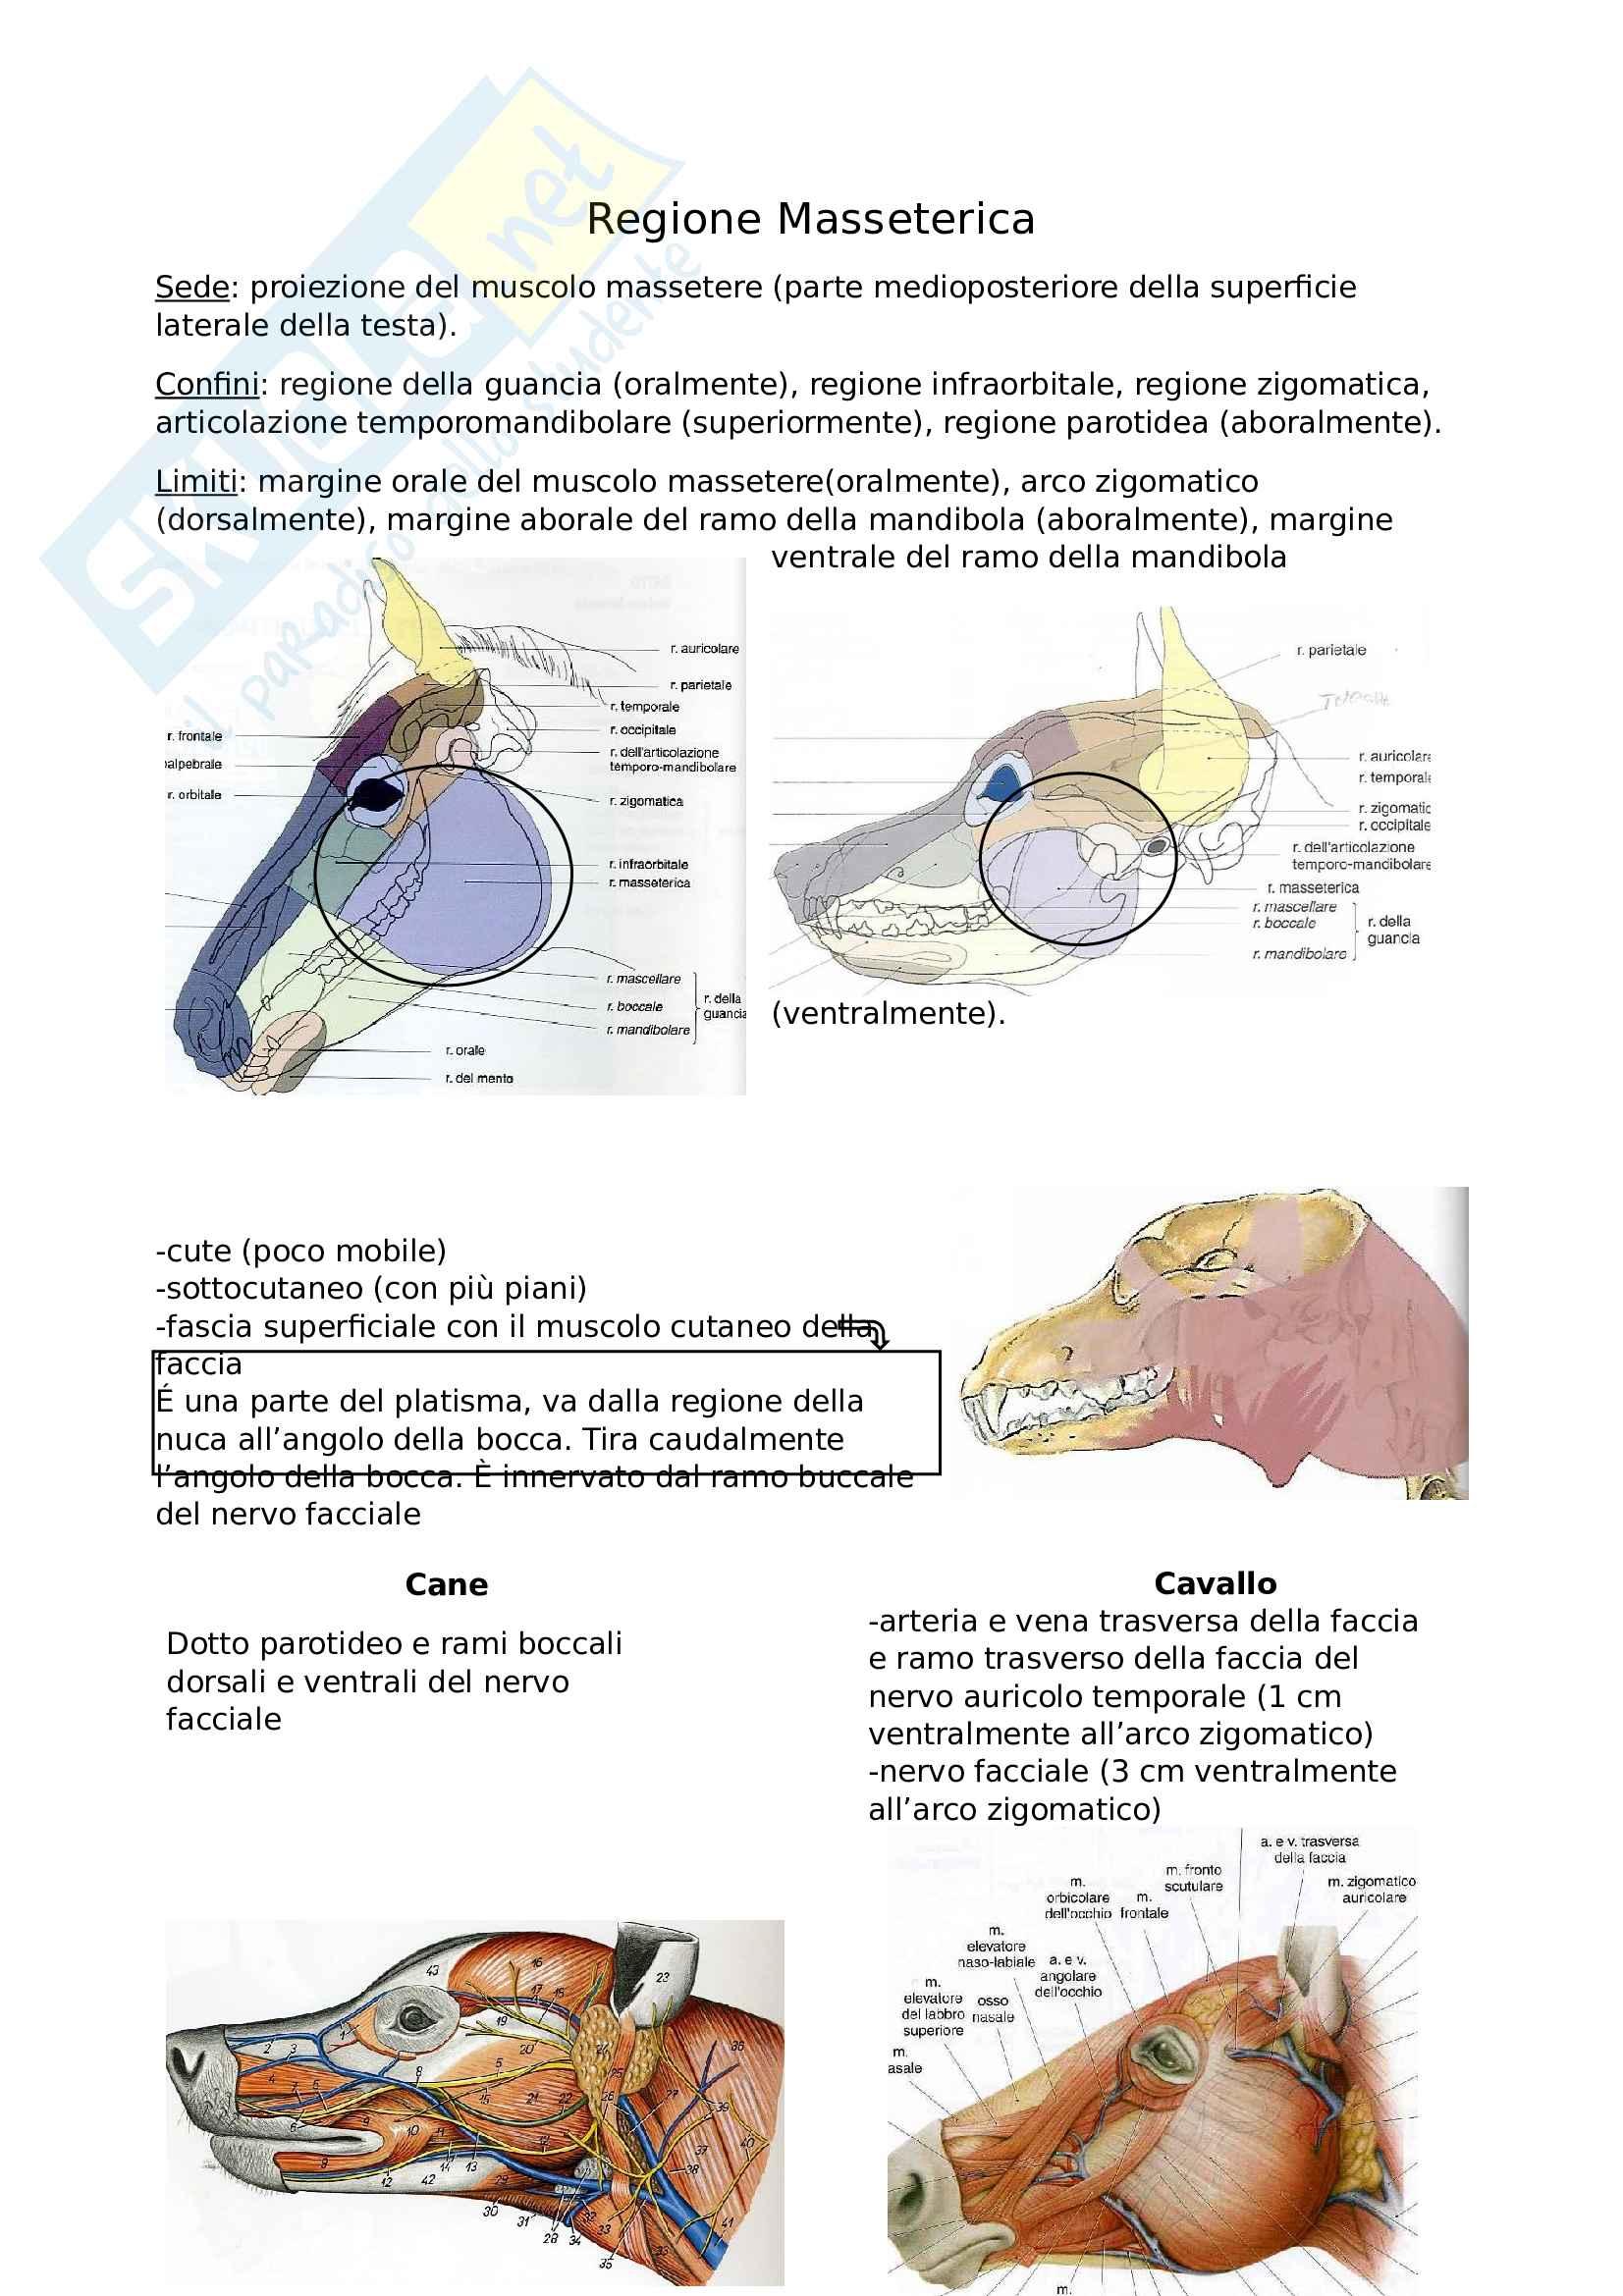 Topografica masseterica, infraorbitale, orbitale, palpebrale, auricolare